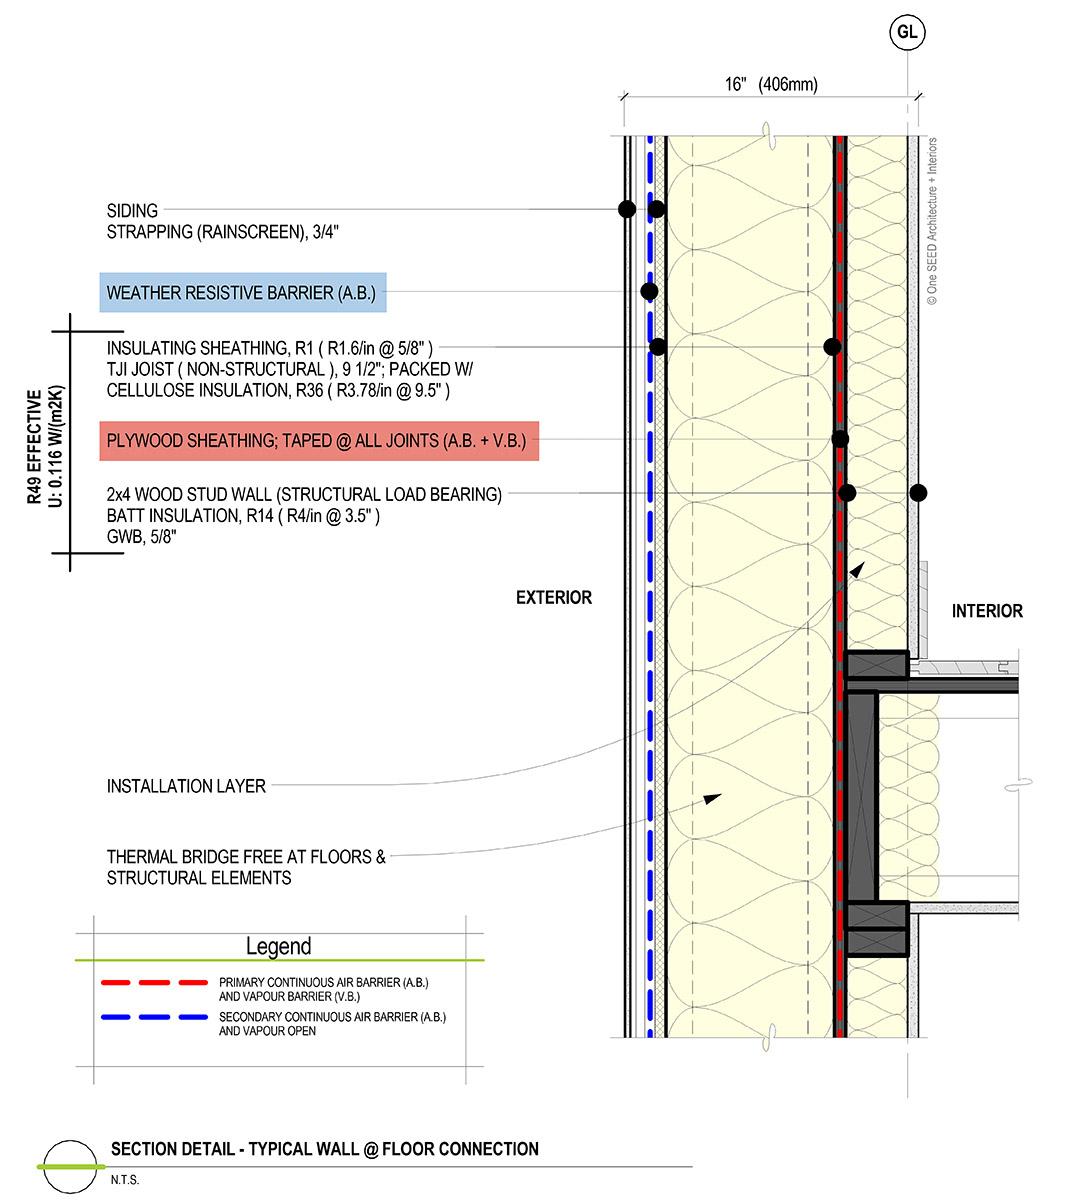 F:DocumentsMy Projects14-01-17 Mahaffey Hung - 34 W21st400